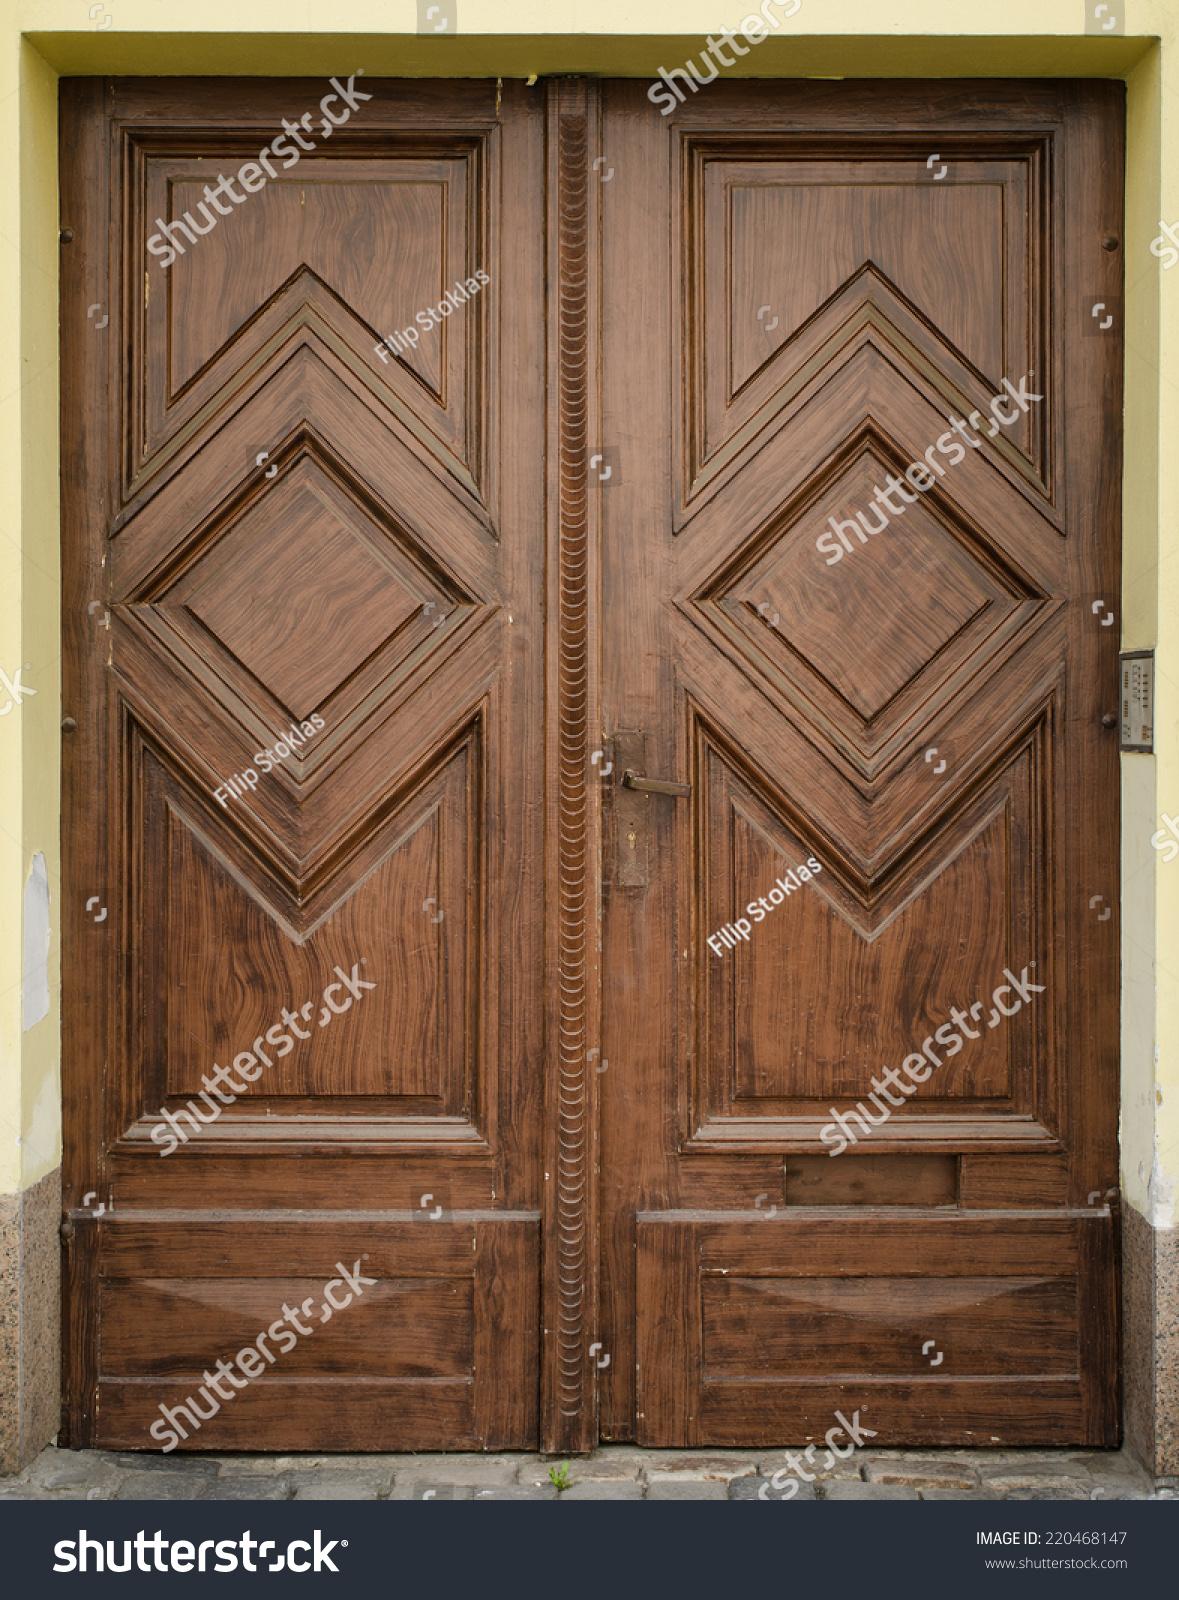 Historical ornate wooden door prague the czech republic for Door z prague